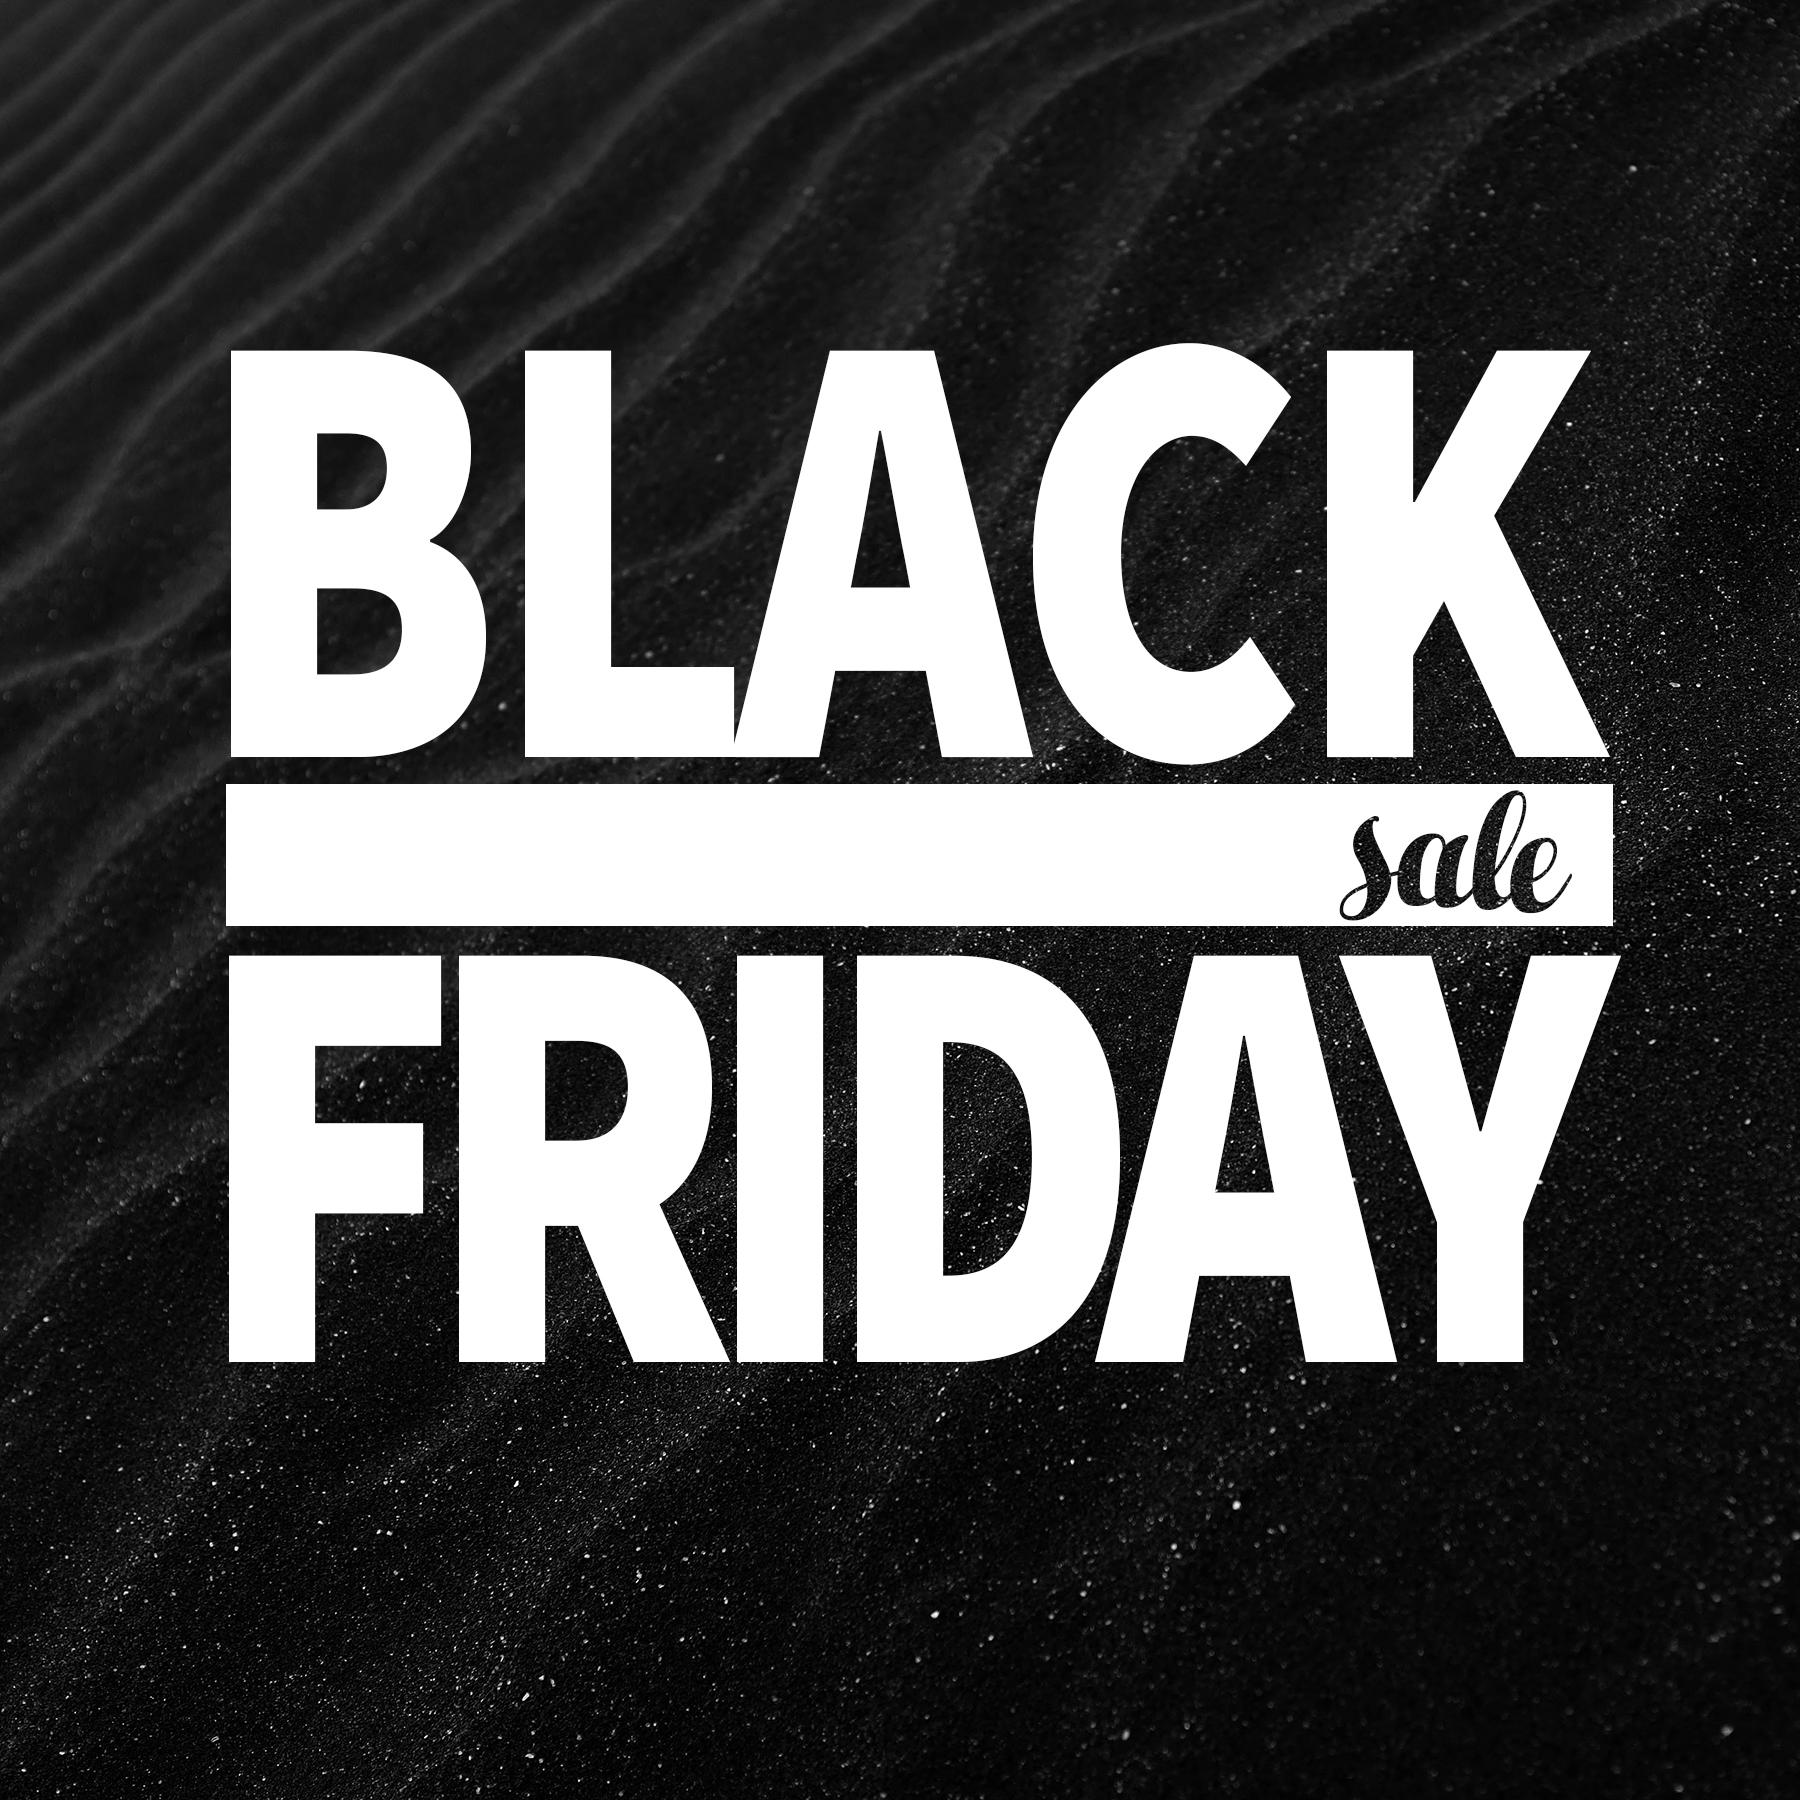 Black Friday Graphics